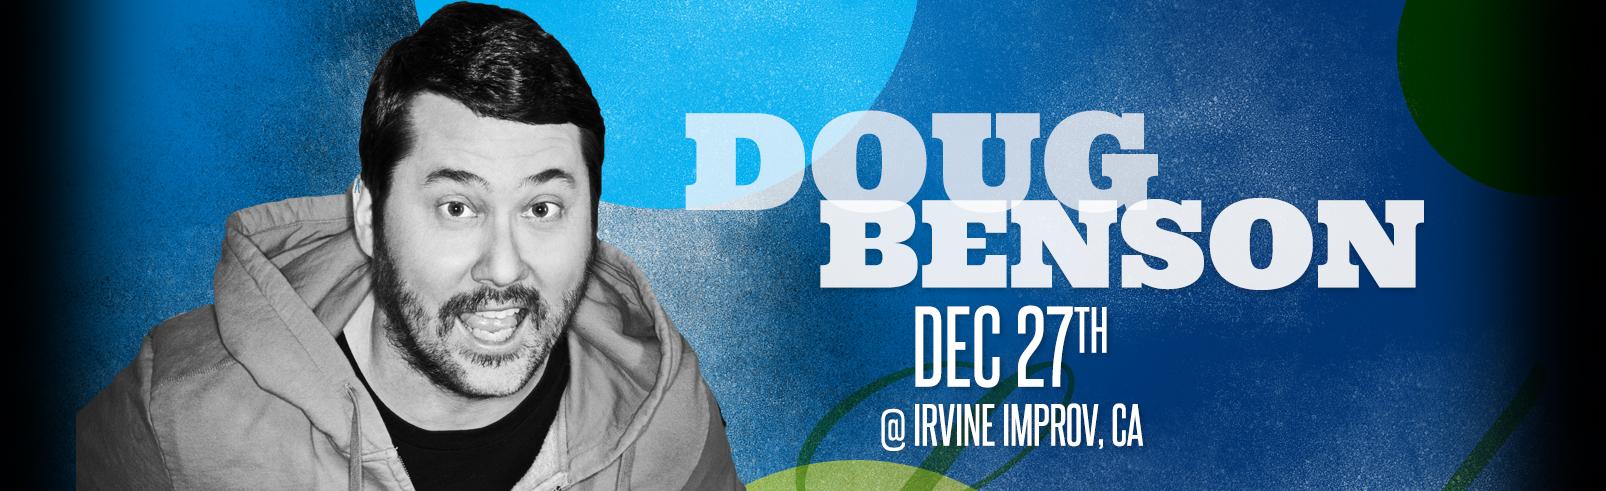 Doug Benson @ Irvine Improv